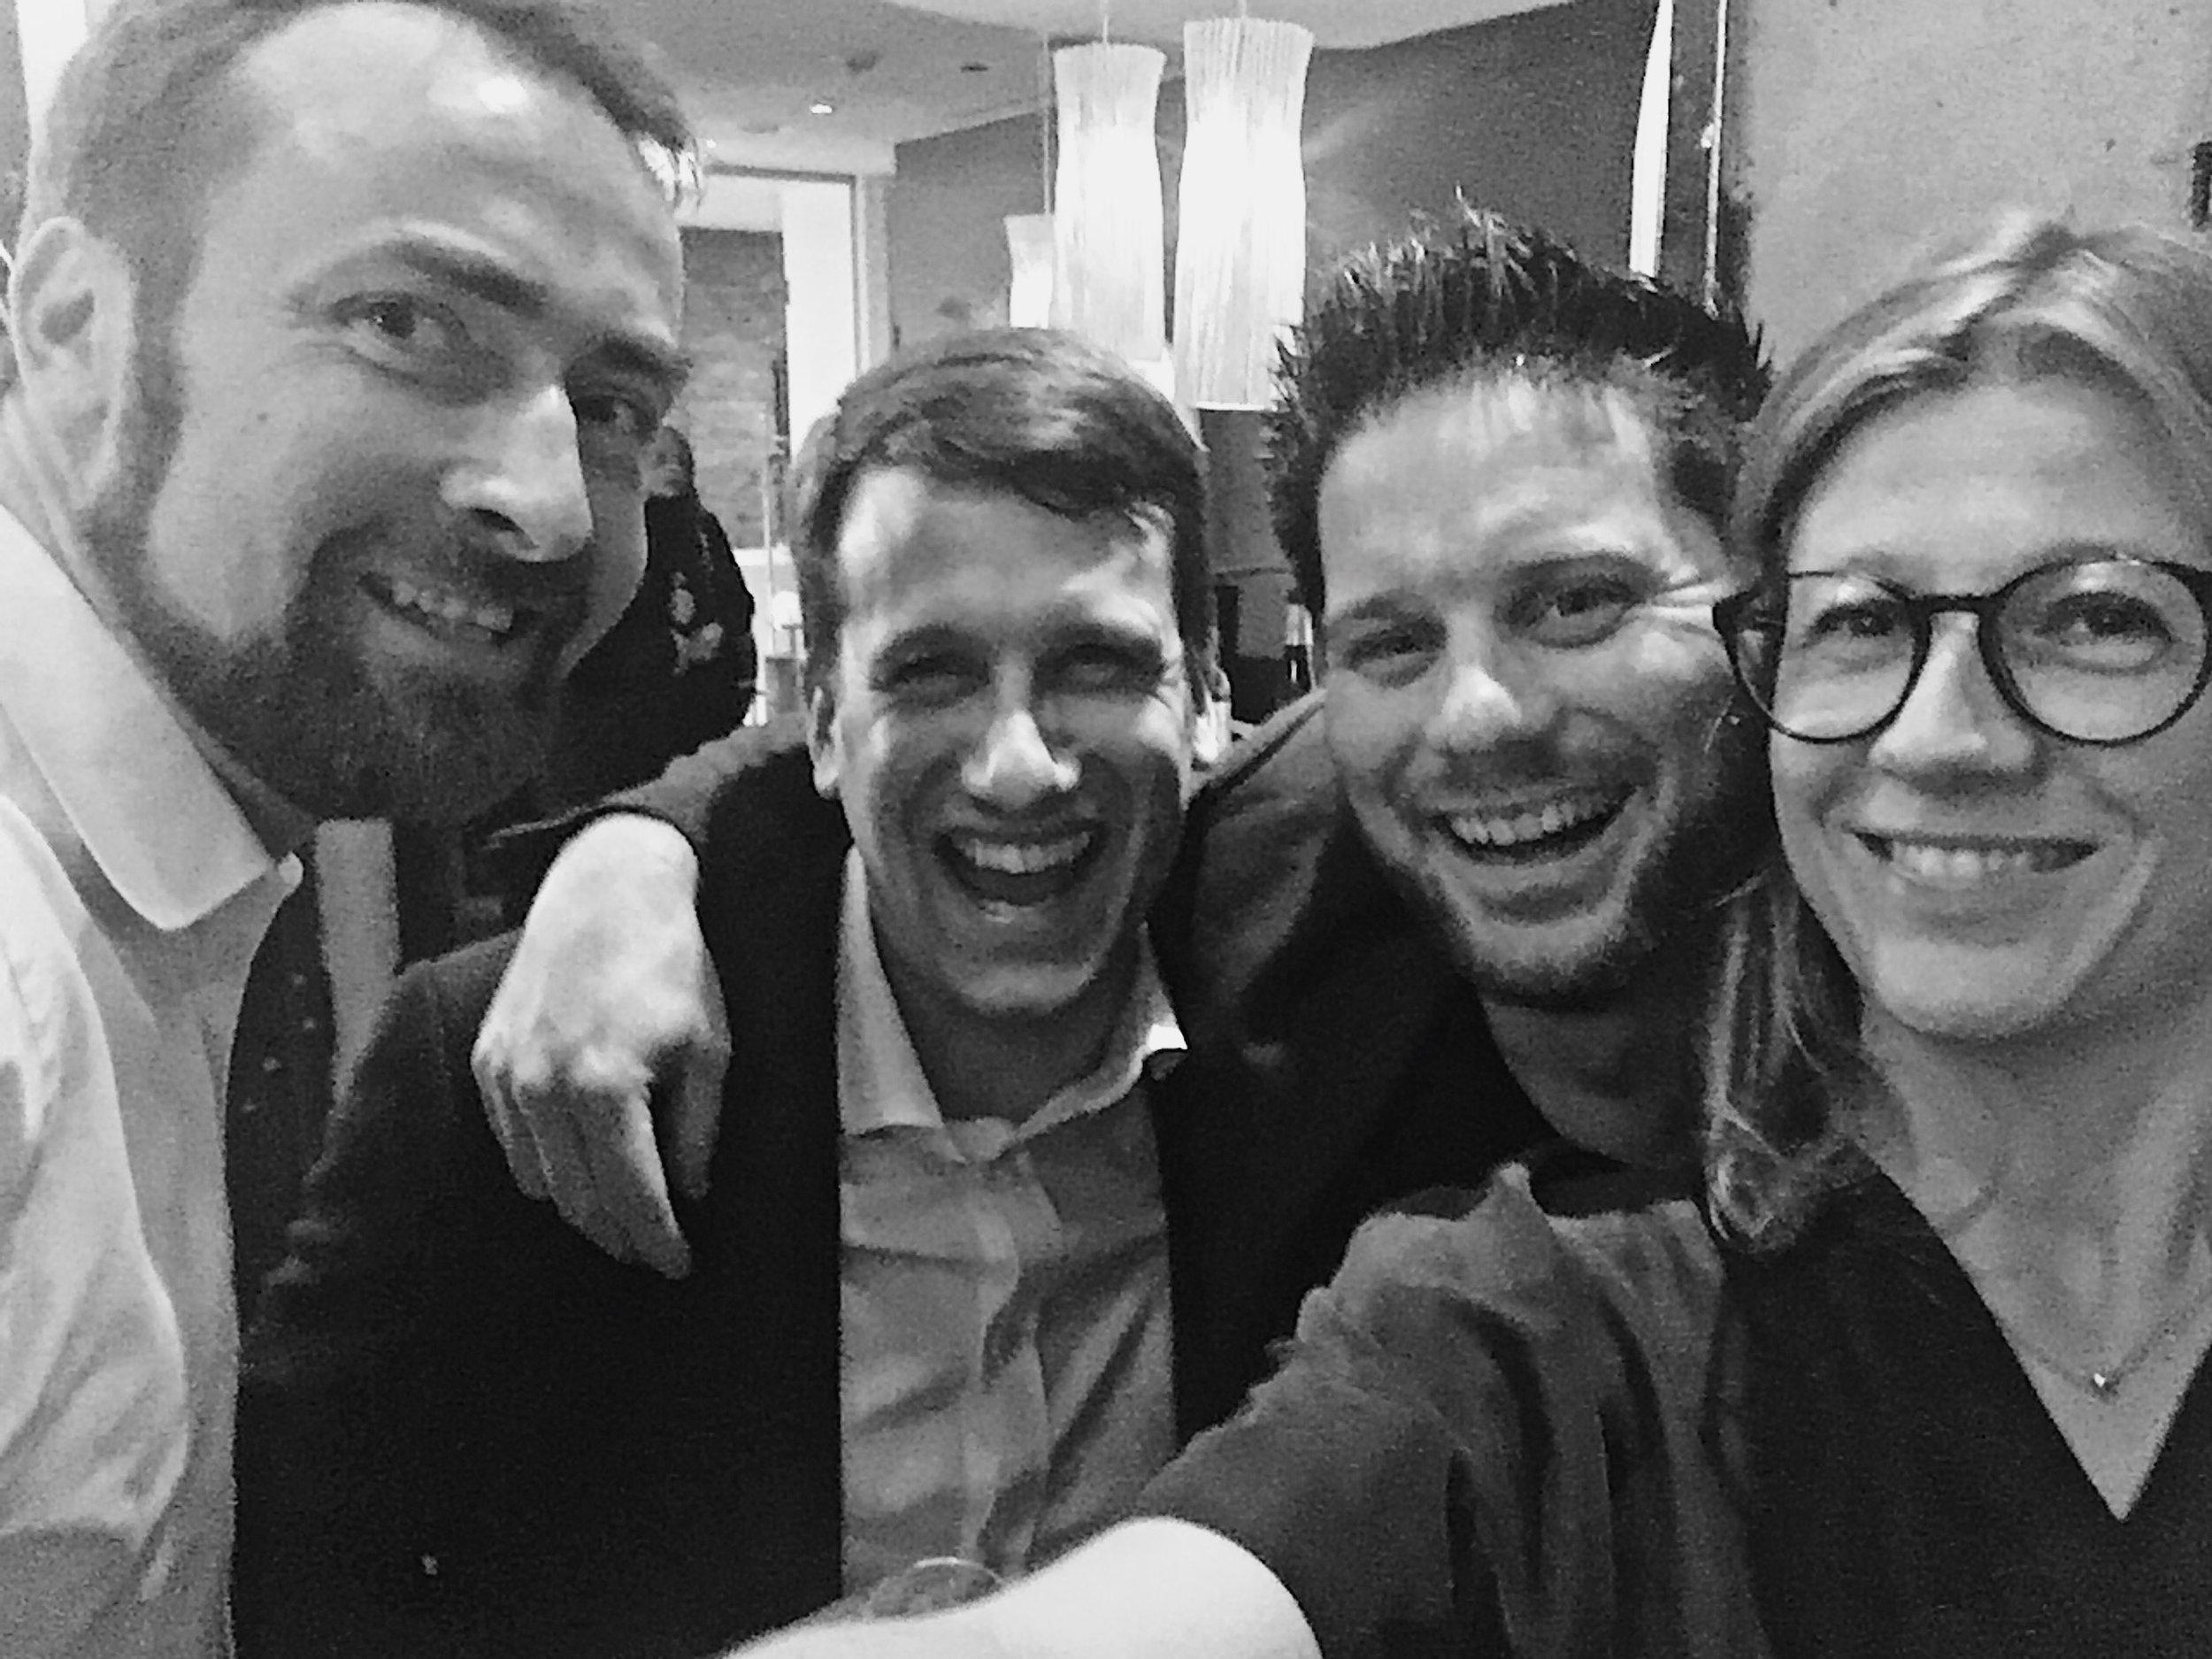 Meeting Tobias Fricke from Gut Hermannsberg and sommelier Emmanuel Rosier at the Riesling Swag in Hamburg.